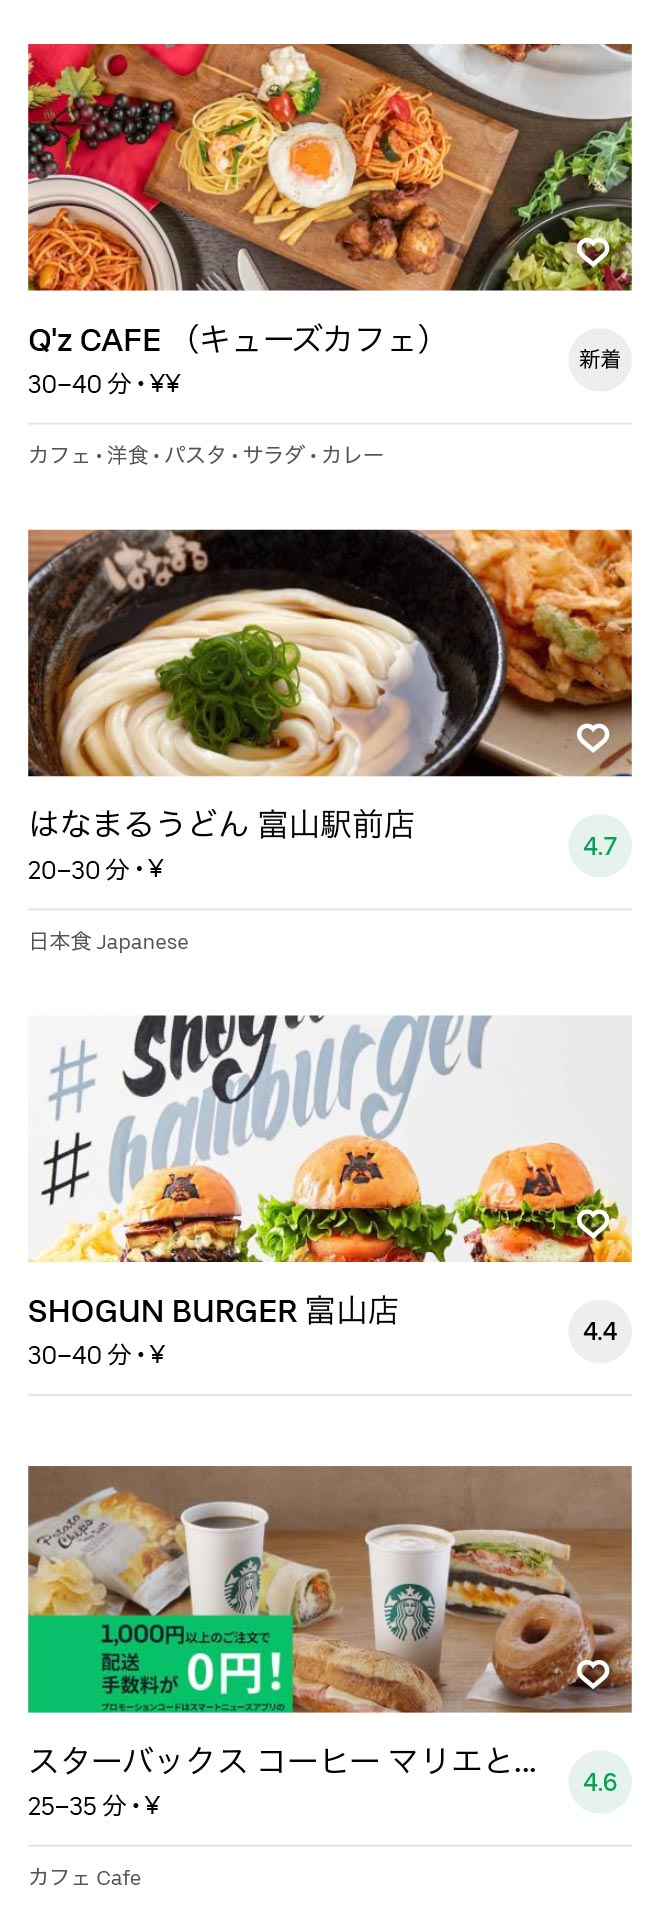 Toyama menu 2009 03